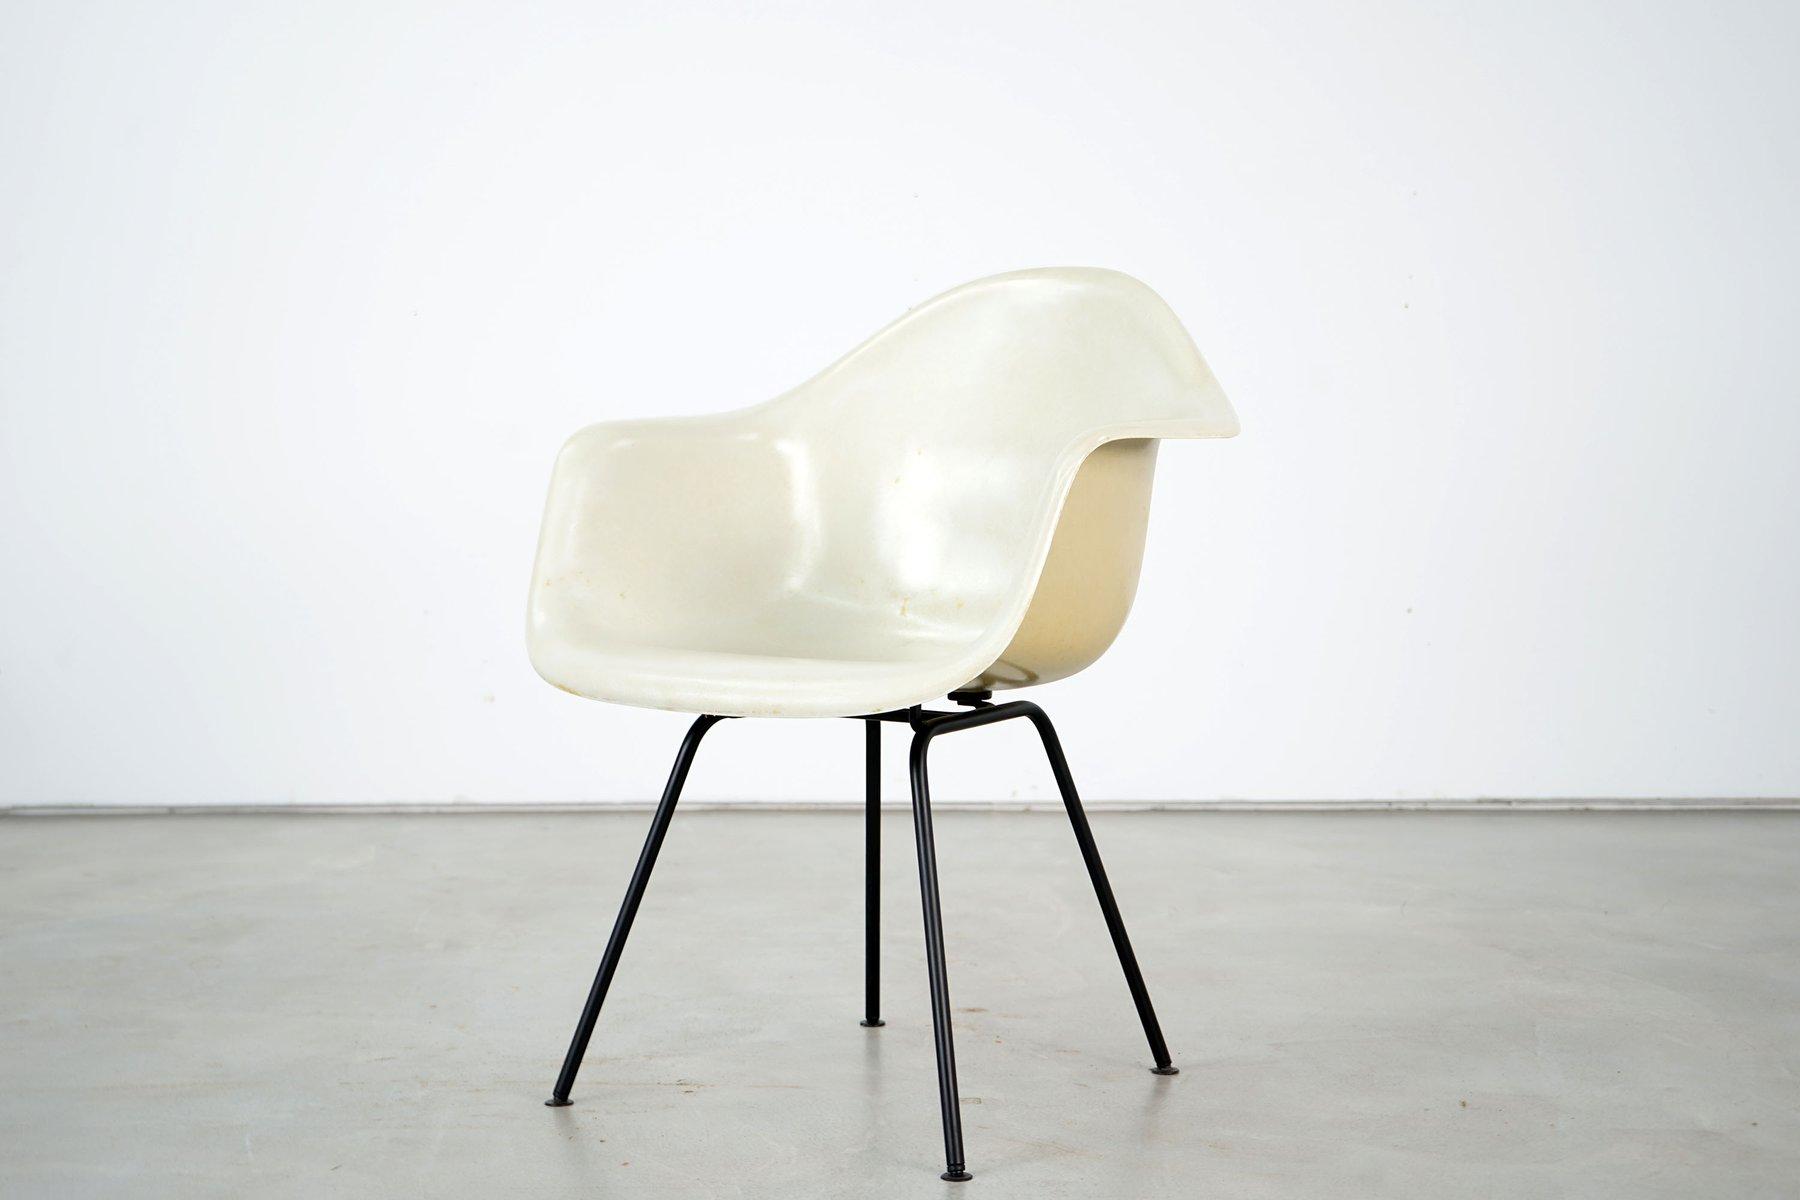 glasfaser sessel von charles ray eames f r herman miller 1960er bei pamono kaufen. Black Bedroom Furniture Sets. Home Design Ideas